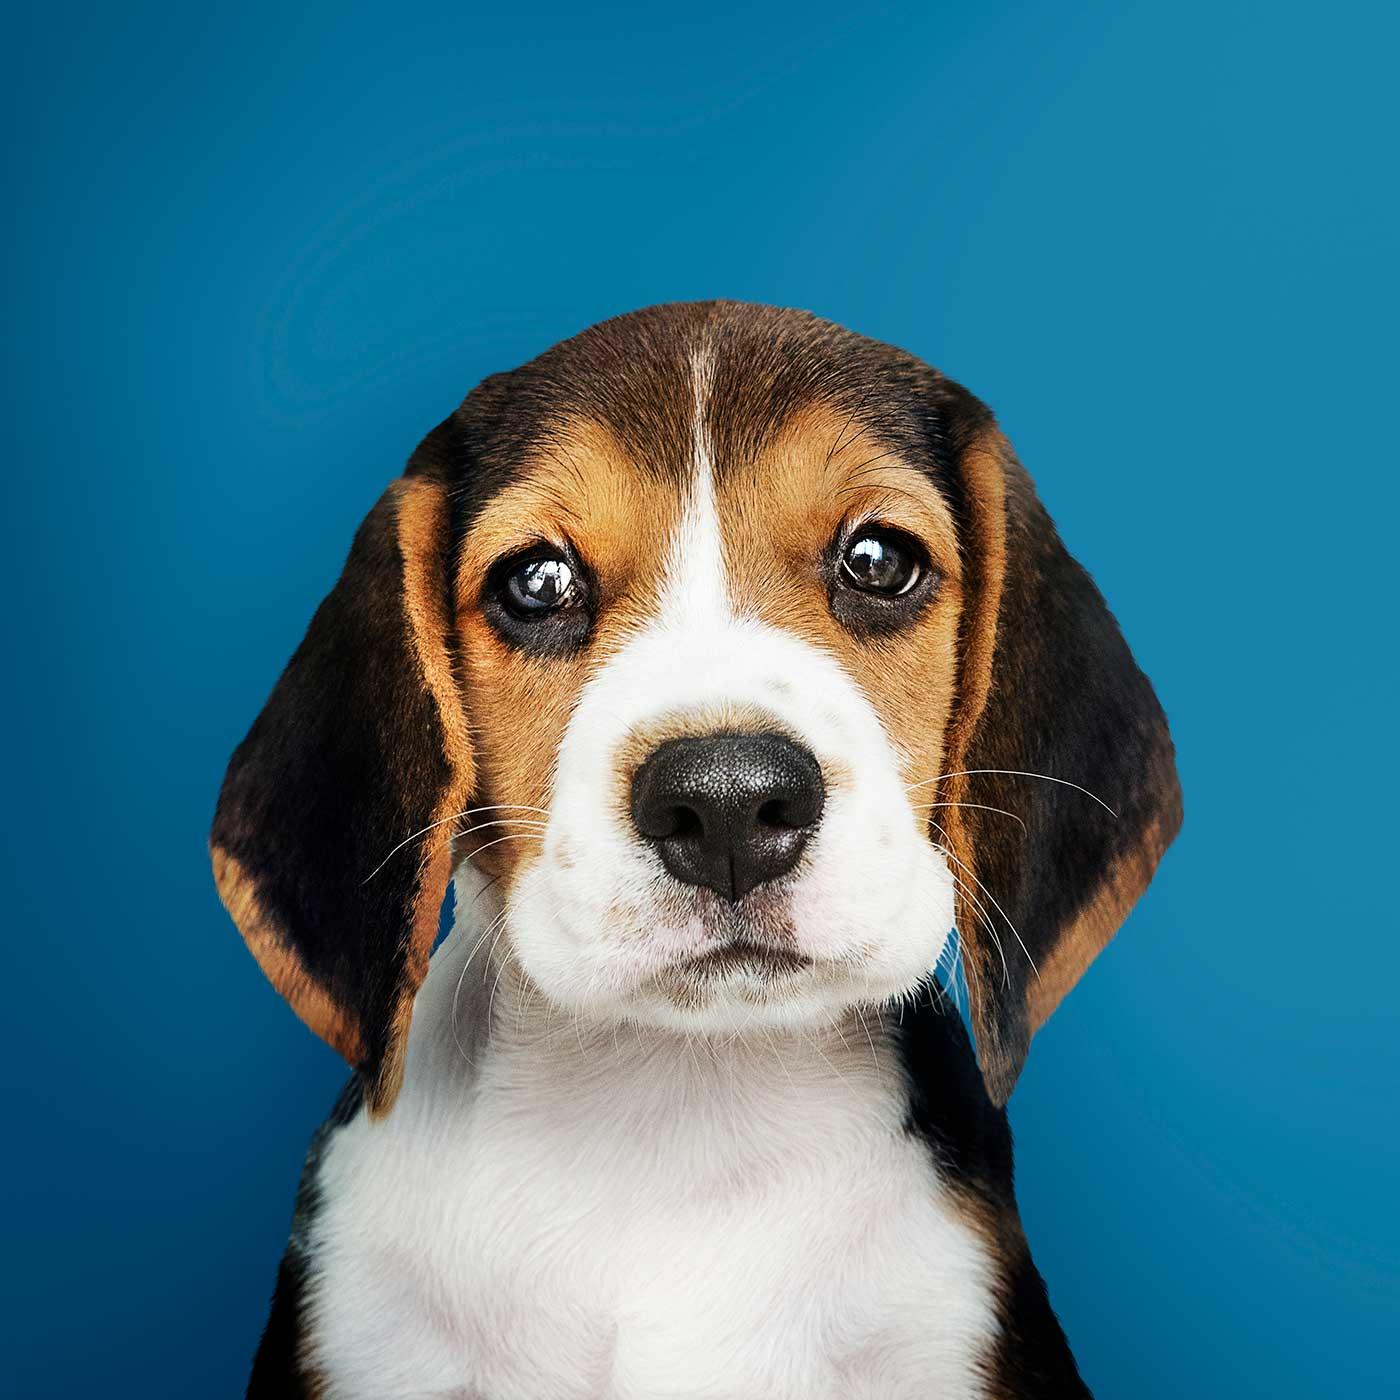 Un joli petit chien au regard triste.